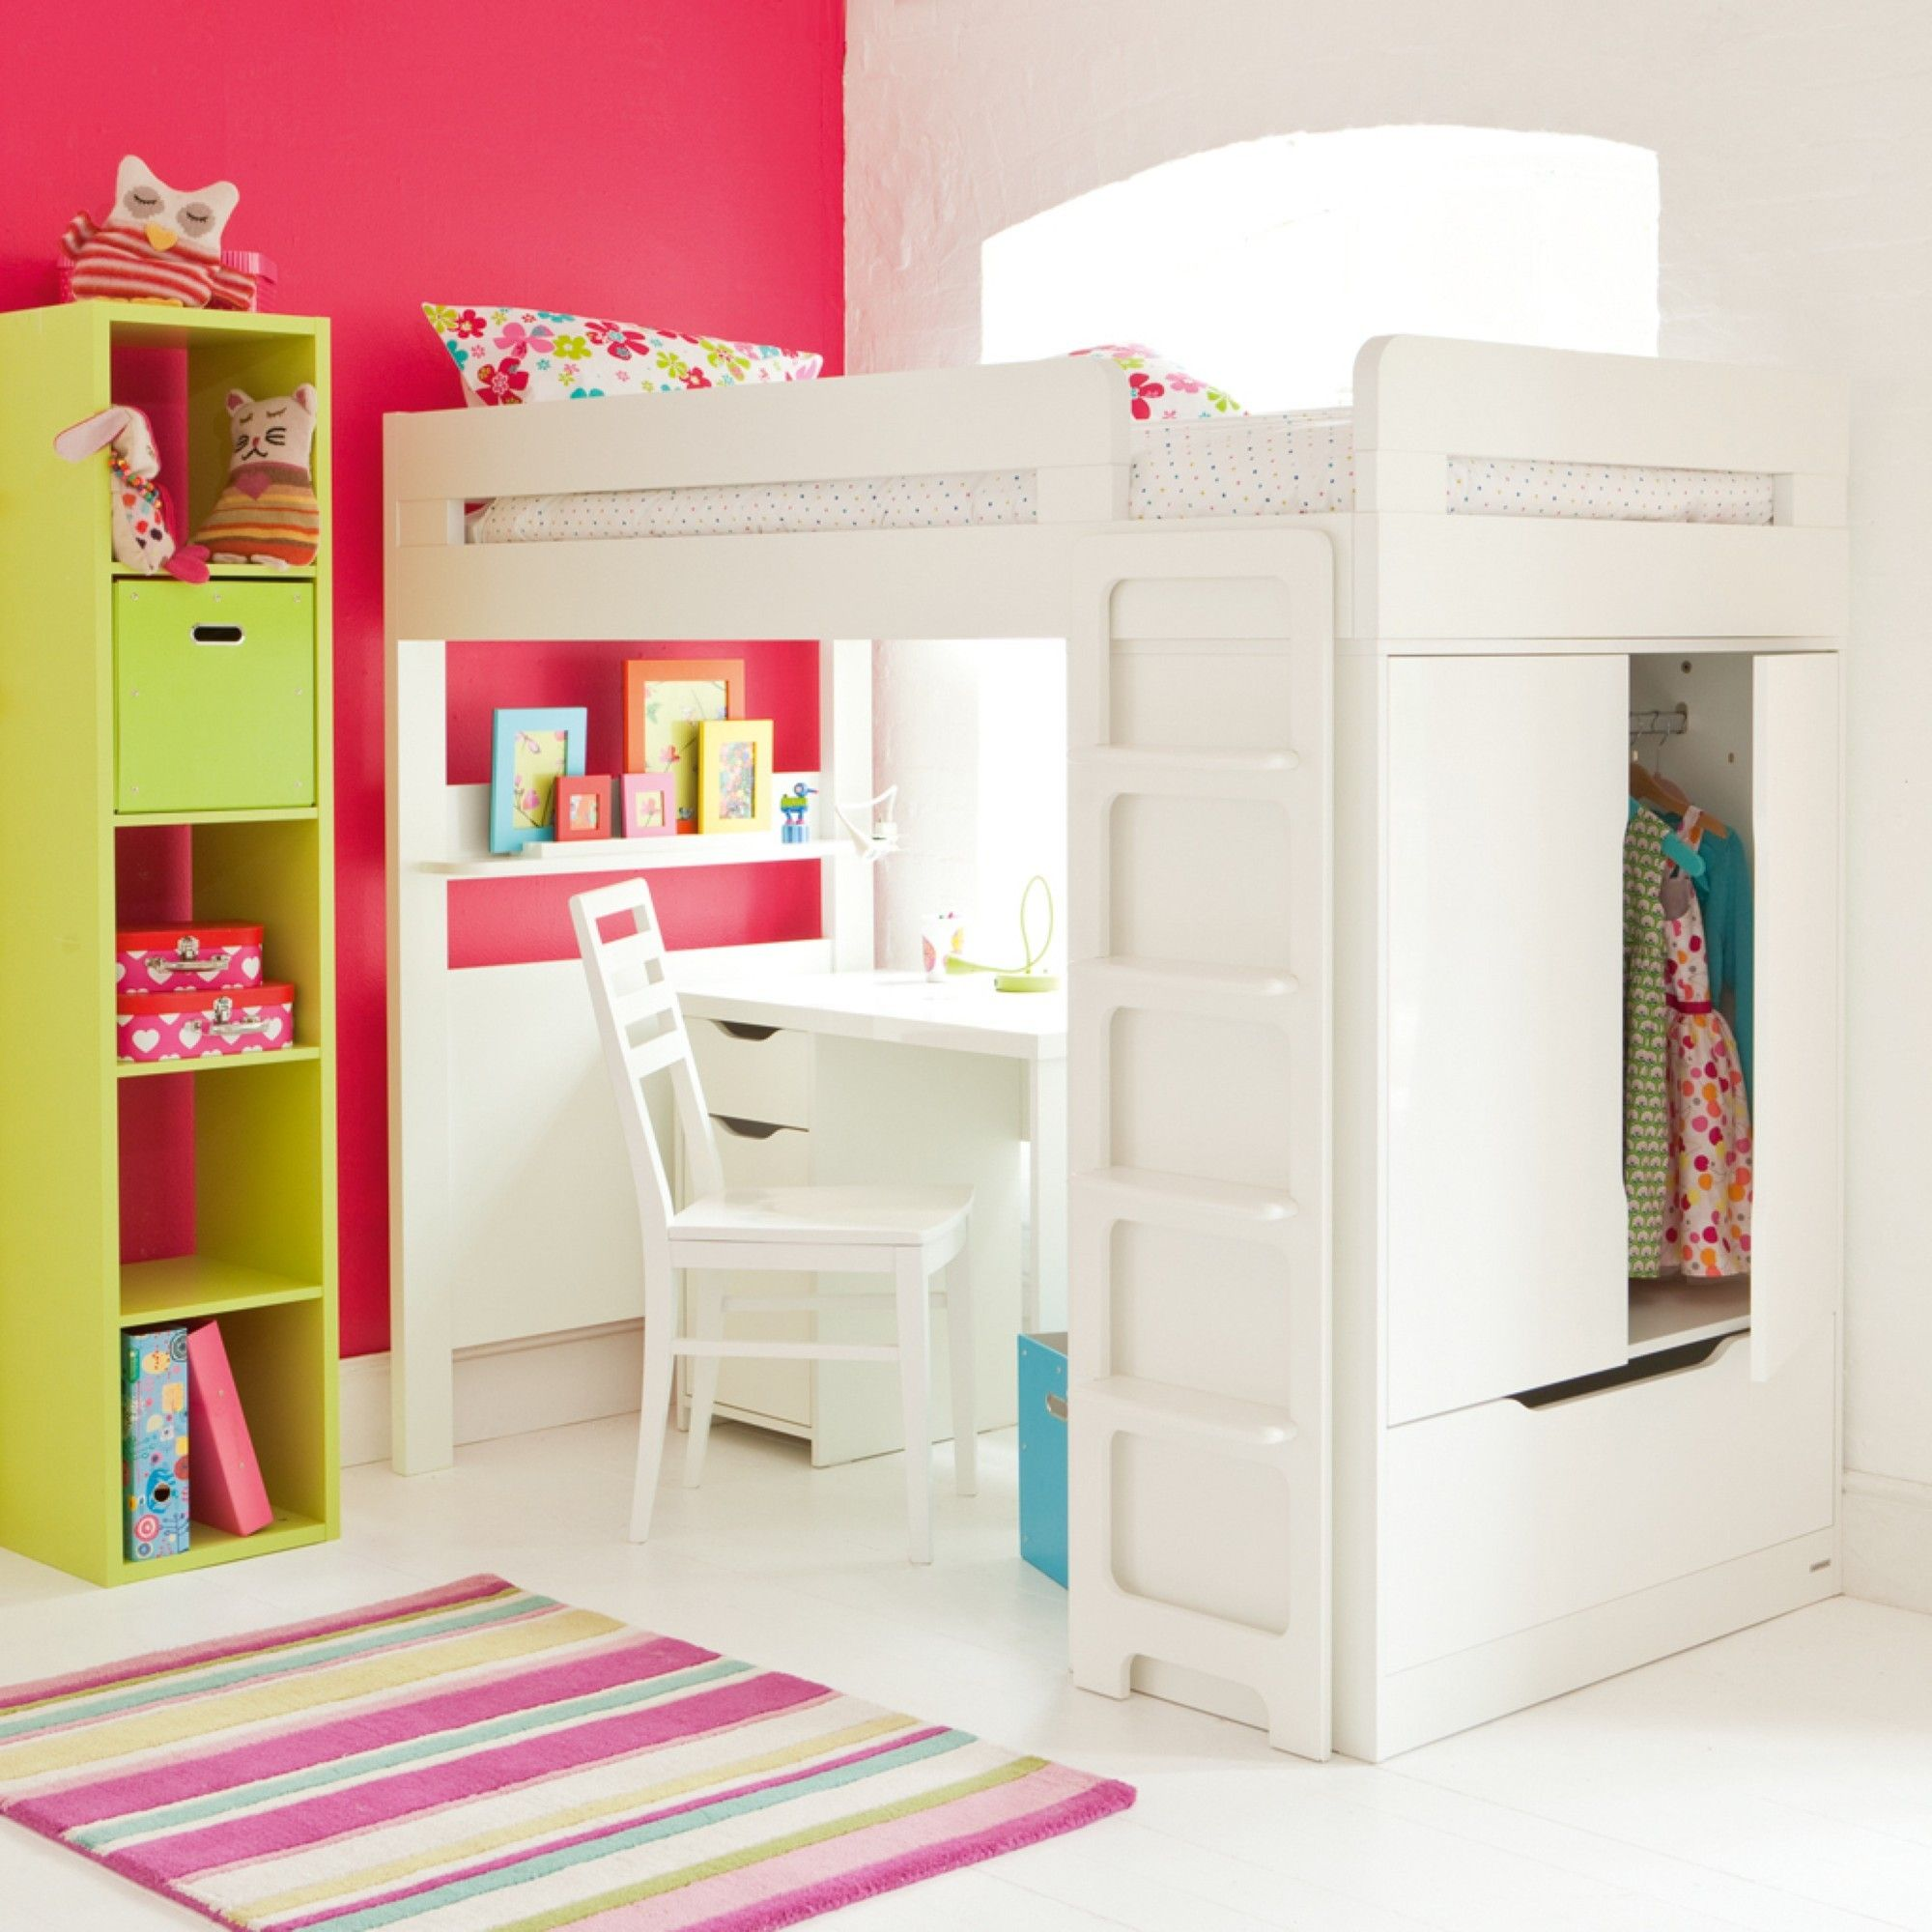 Bed with a desk wardrobe versatile children go bed under table - Farringdon High Sleeper With Desk Aspace